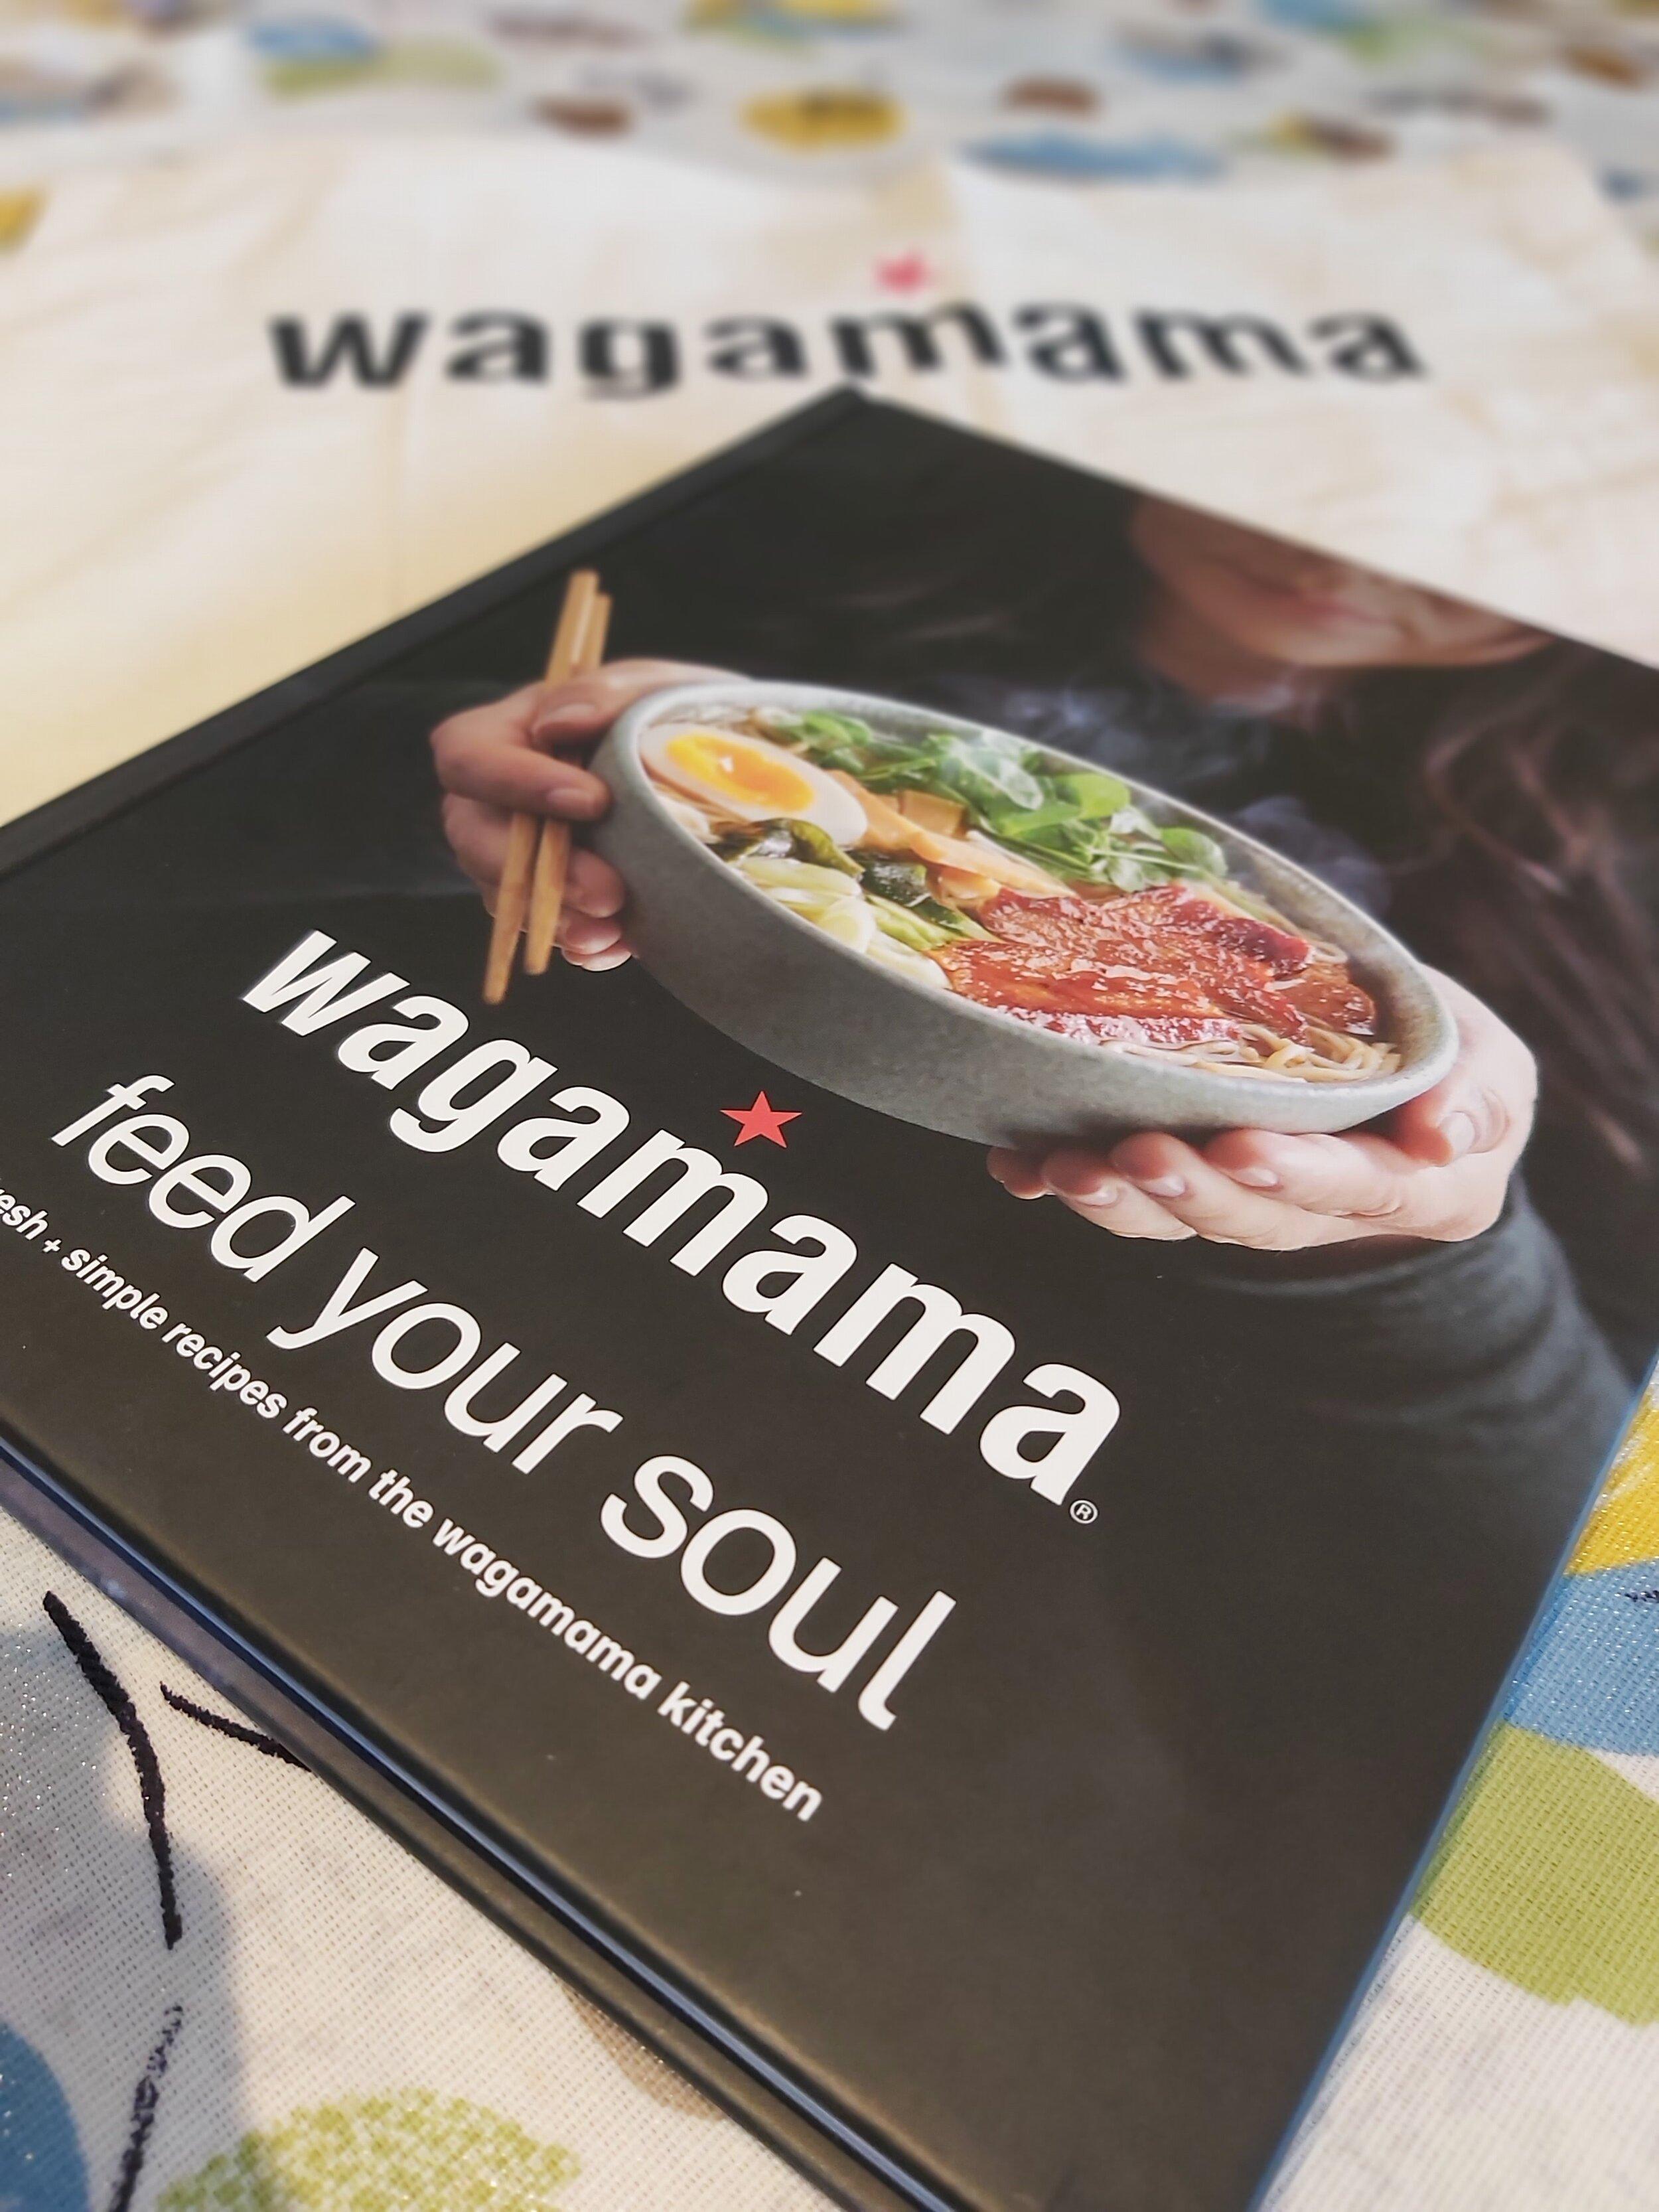 Wagamama - Book pic.jpg